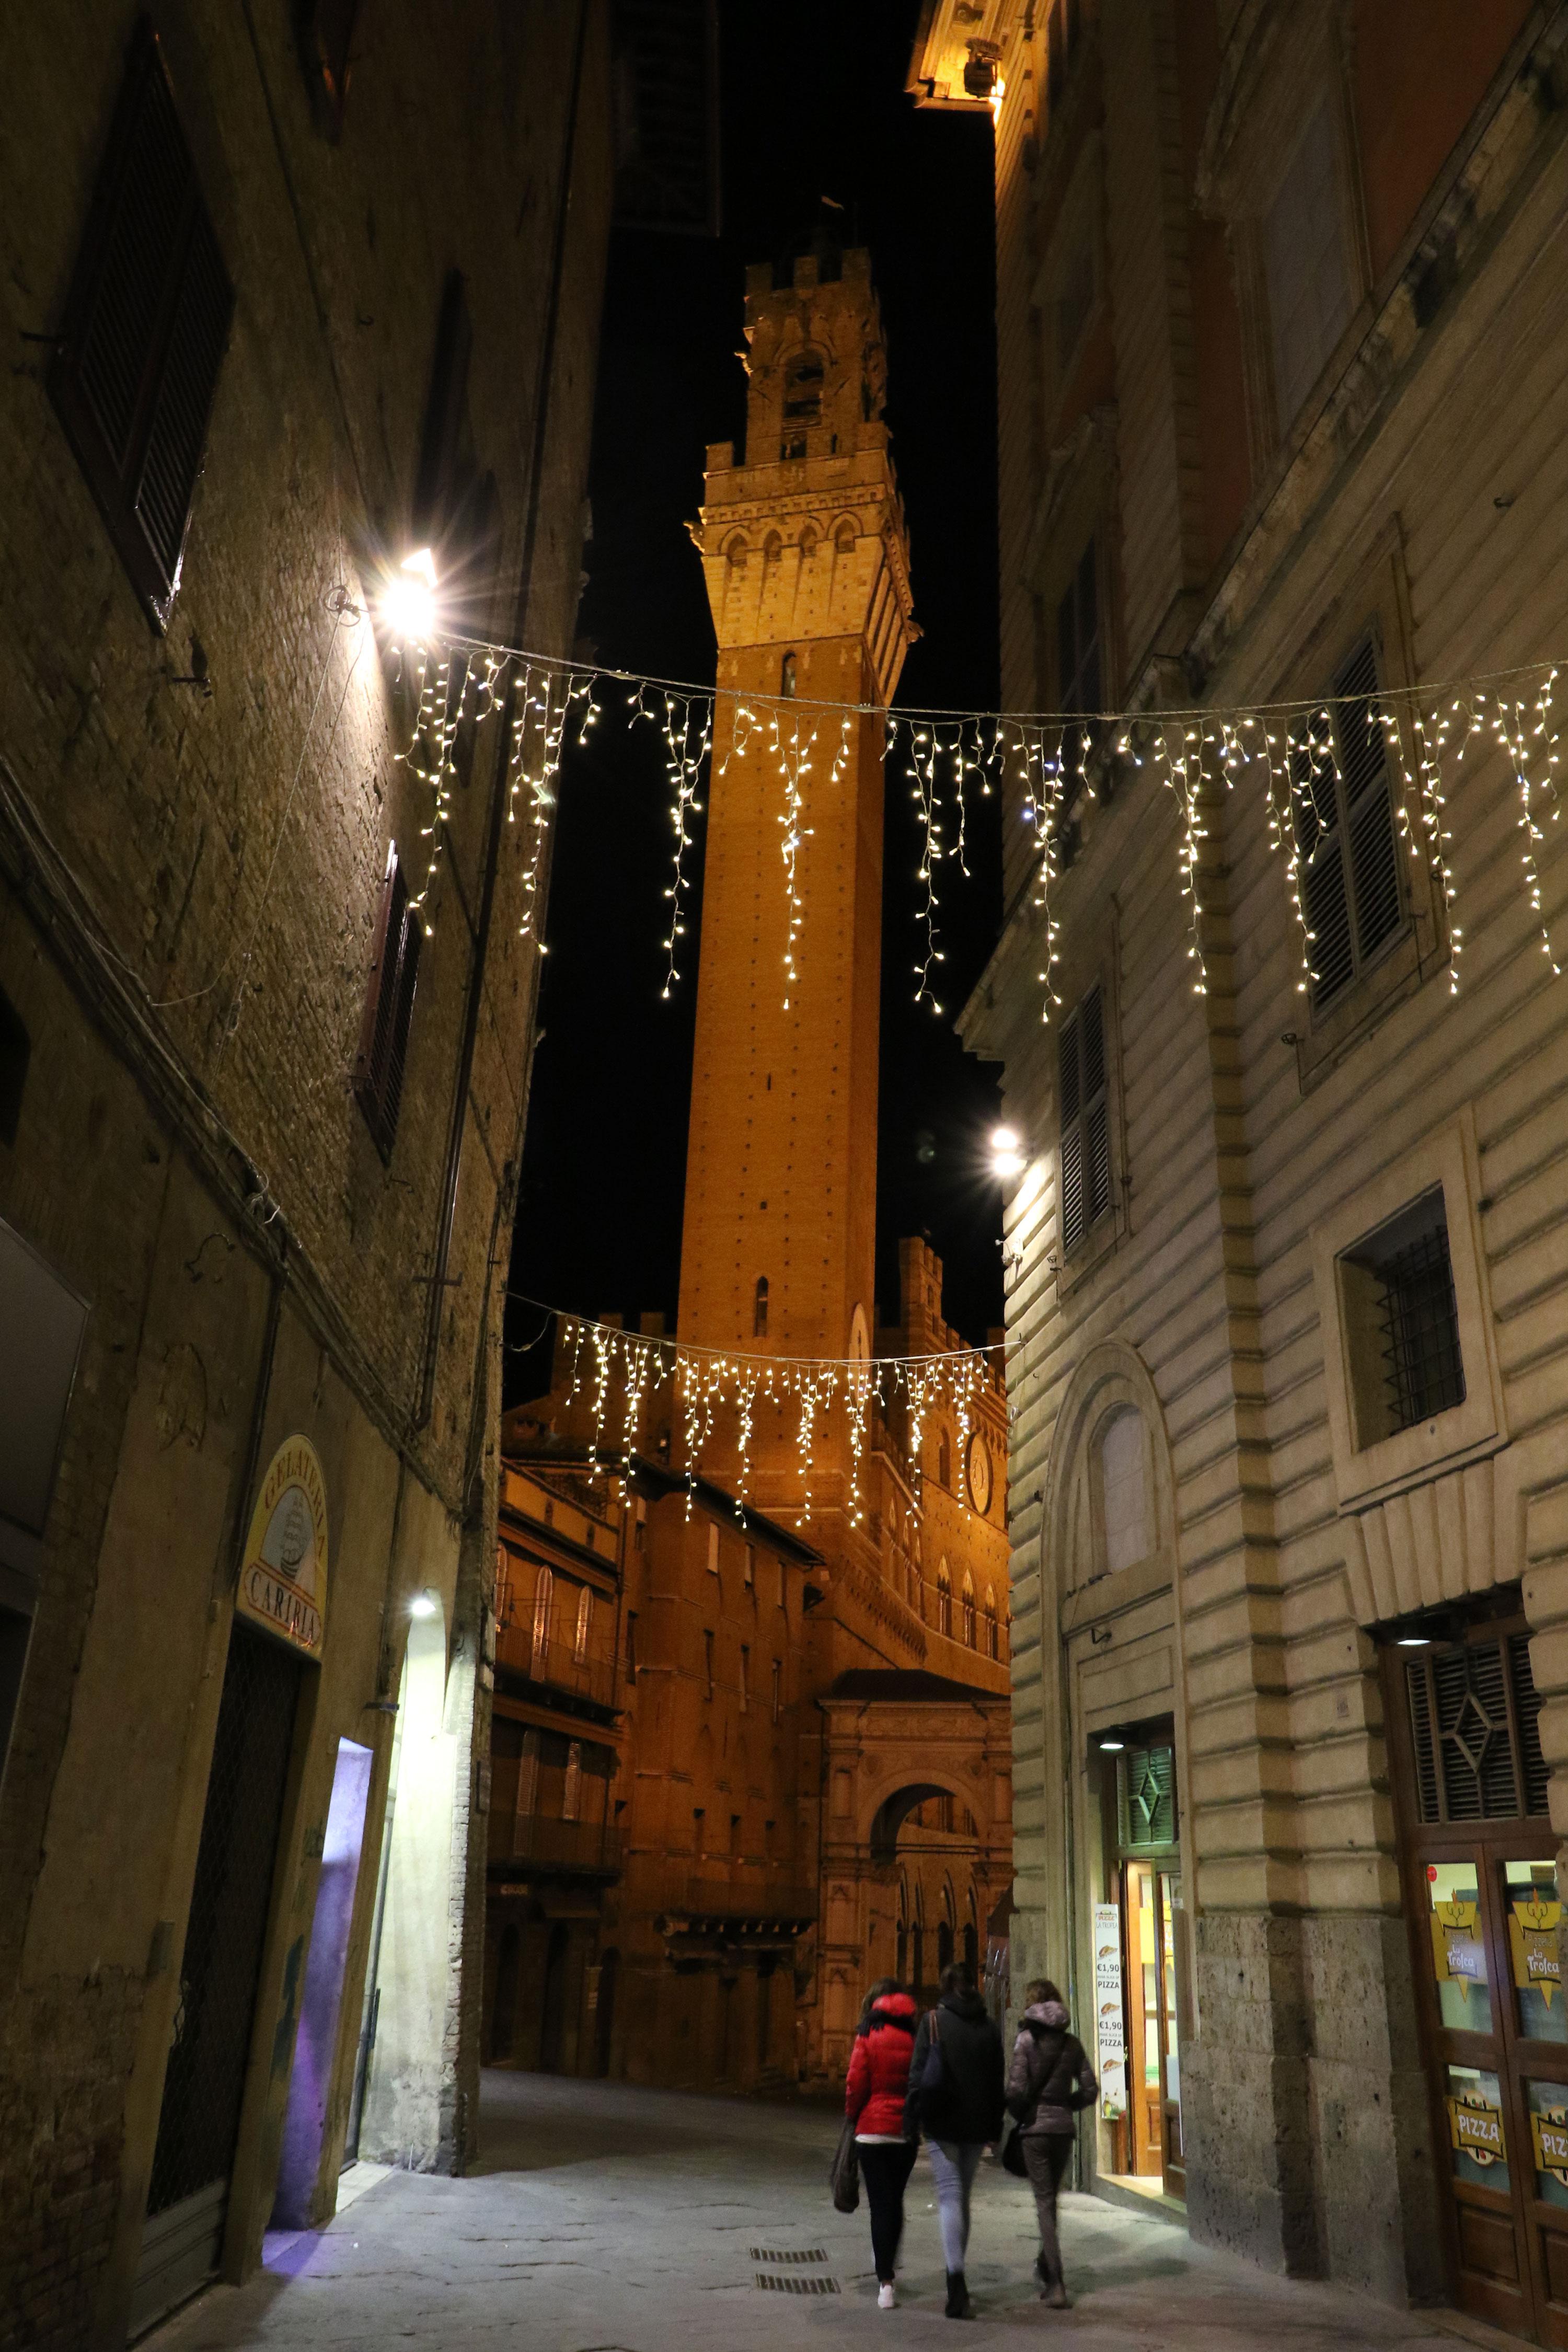 Sienna Tower at night